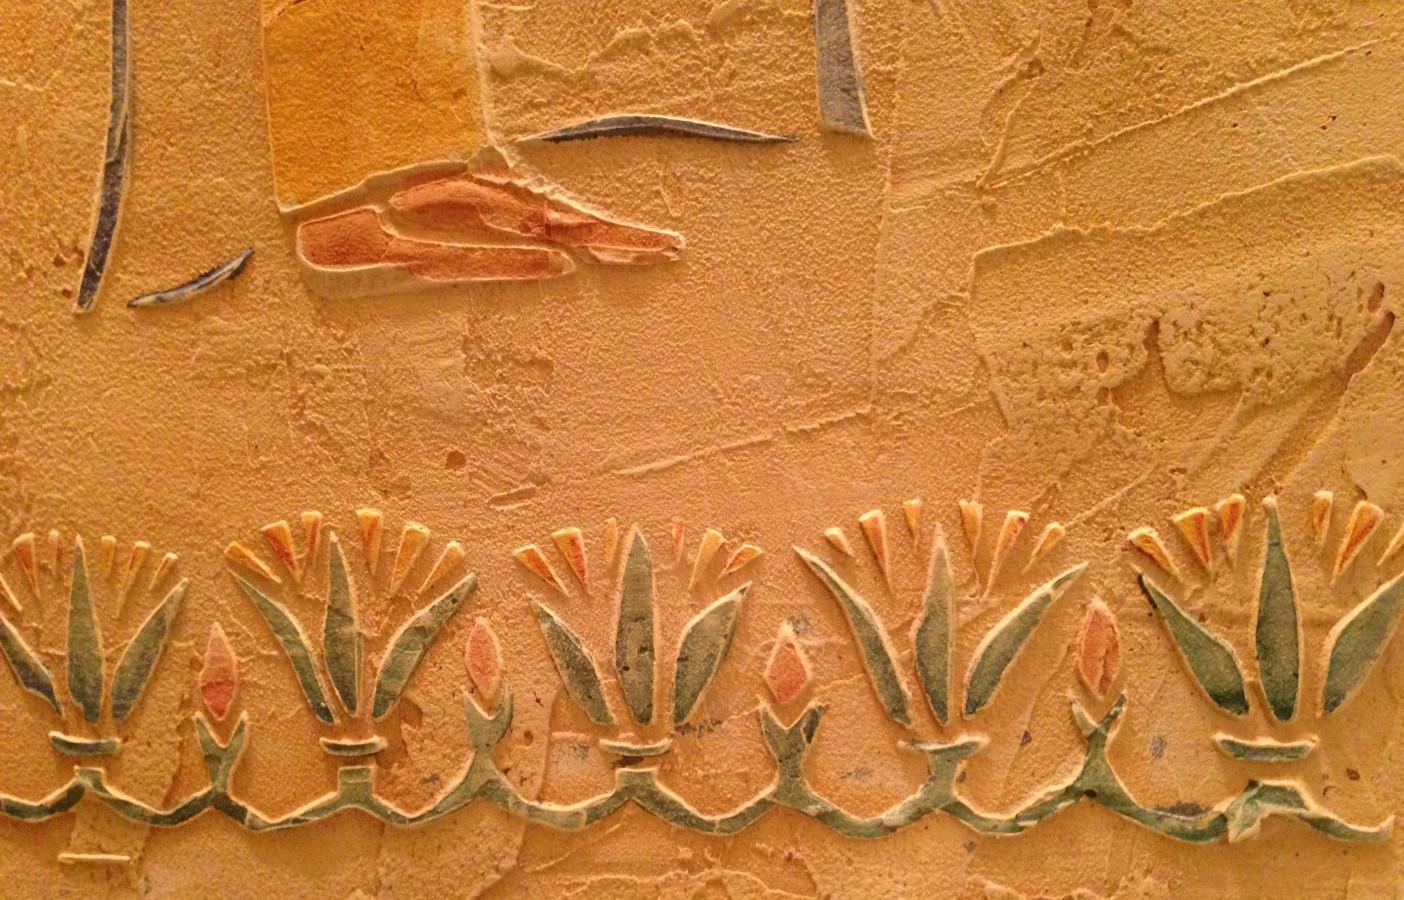 Interjero dekoras. Reljefinis sienos dekoras. Decorated wall. Wall Decor. Embossed wall decor. Interior design. Egyptian motives.